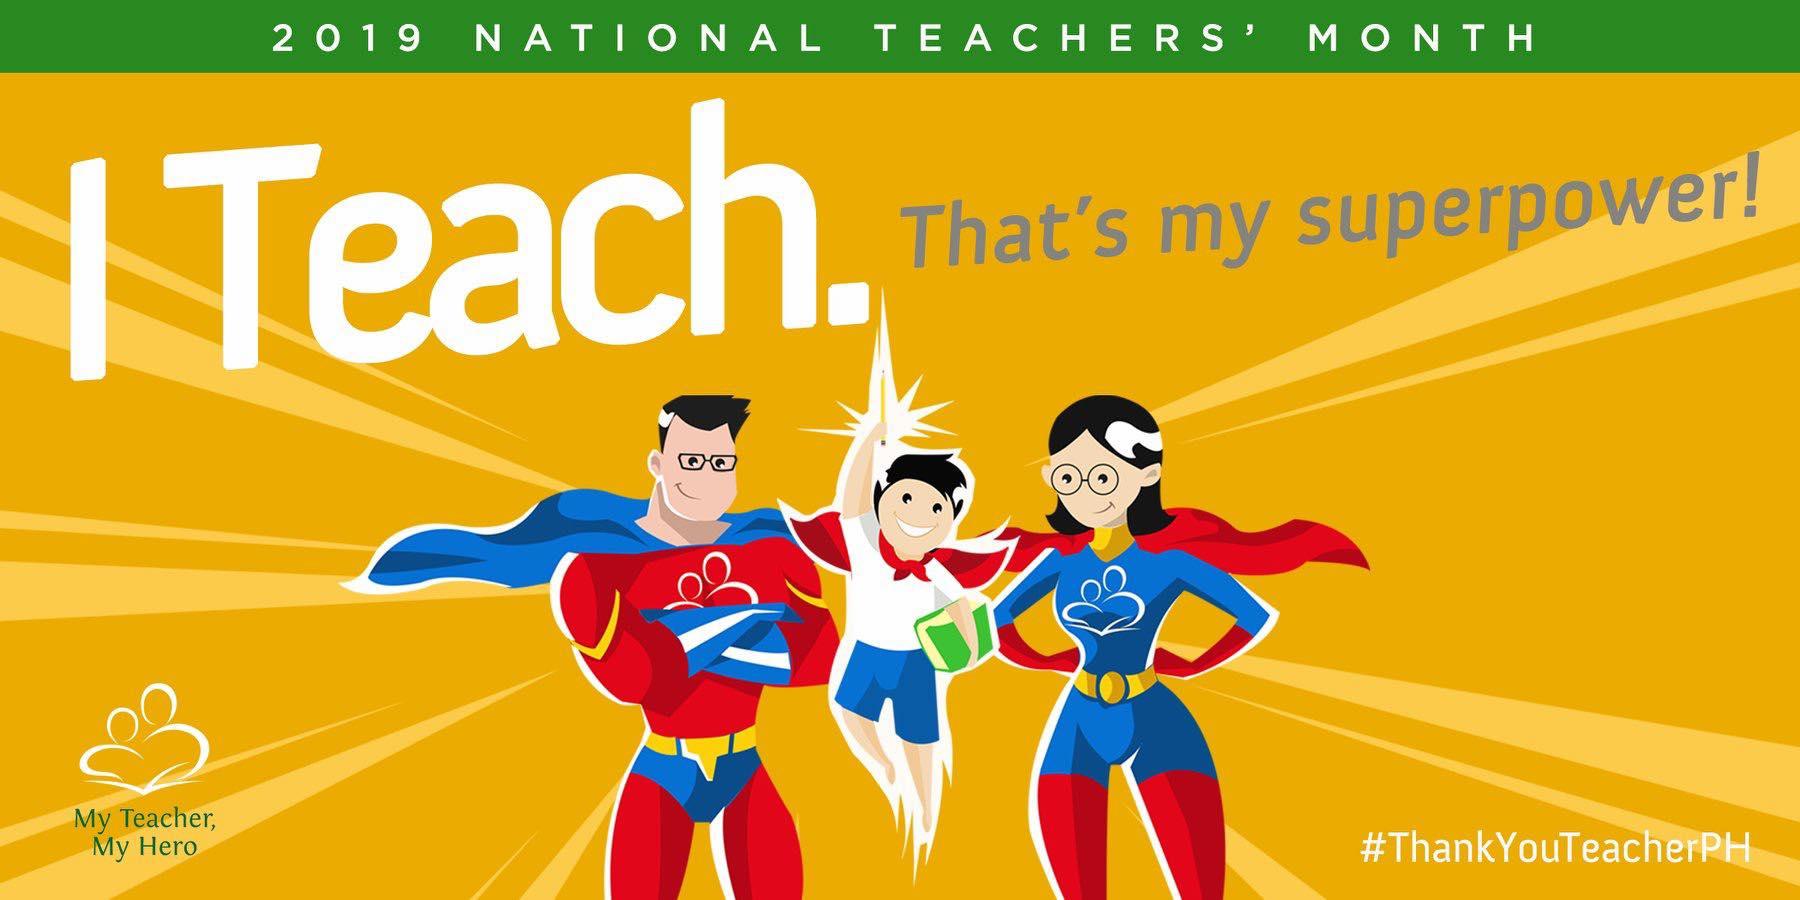 2019 national teachers month celebration